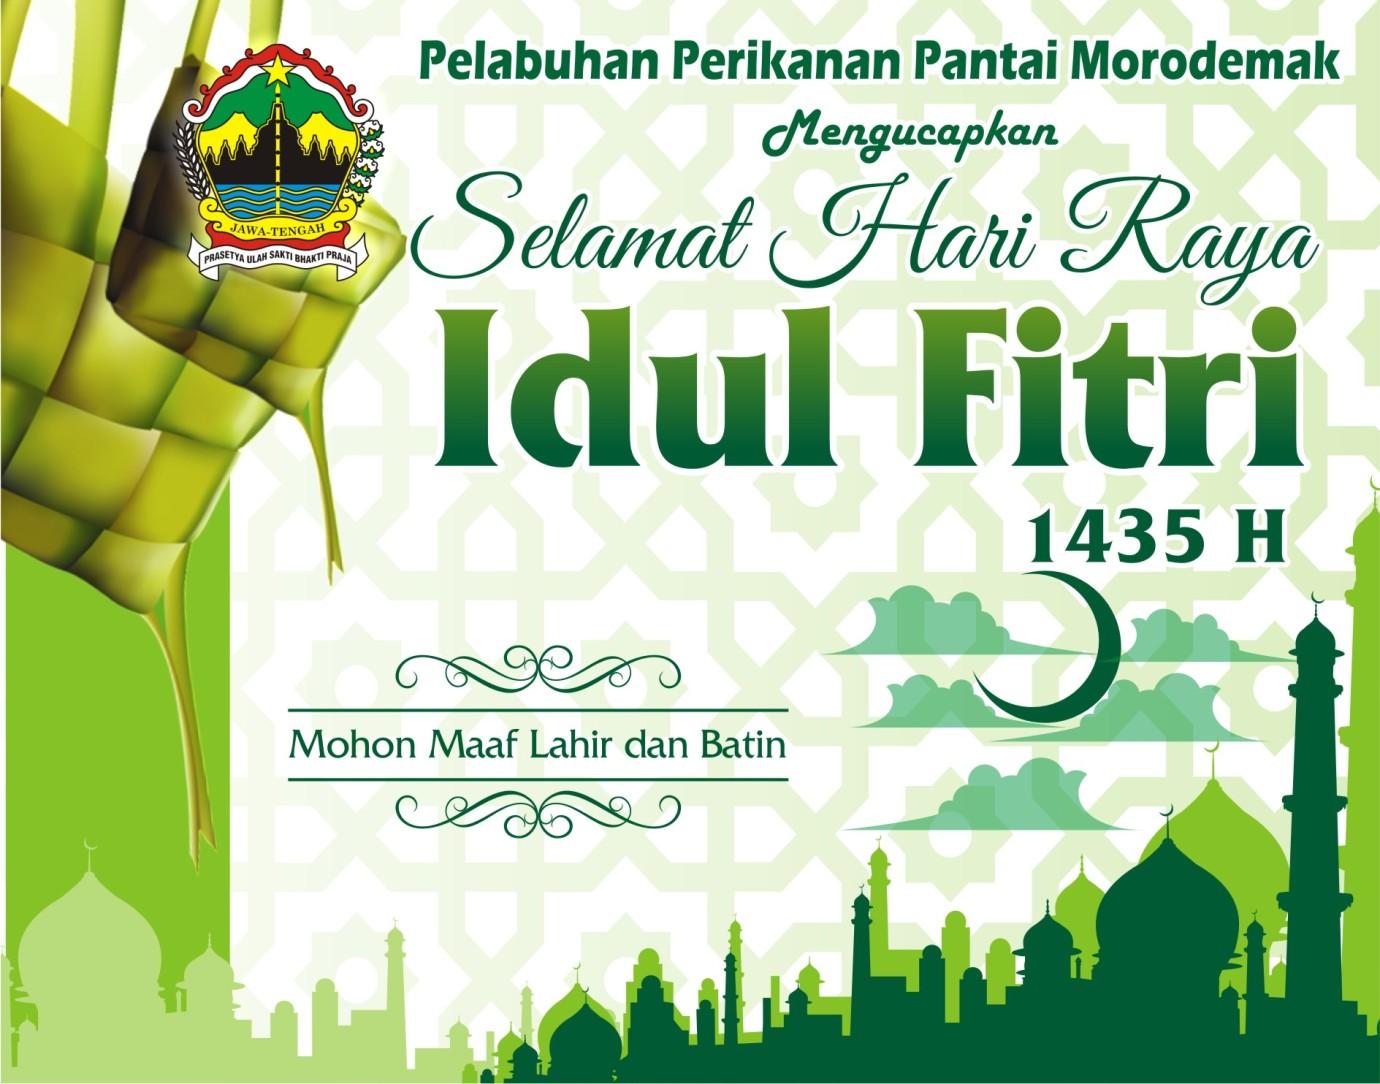 Ucapan Selamat Idul Fitri Ppp Morodemak